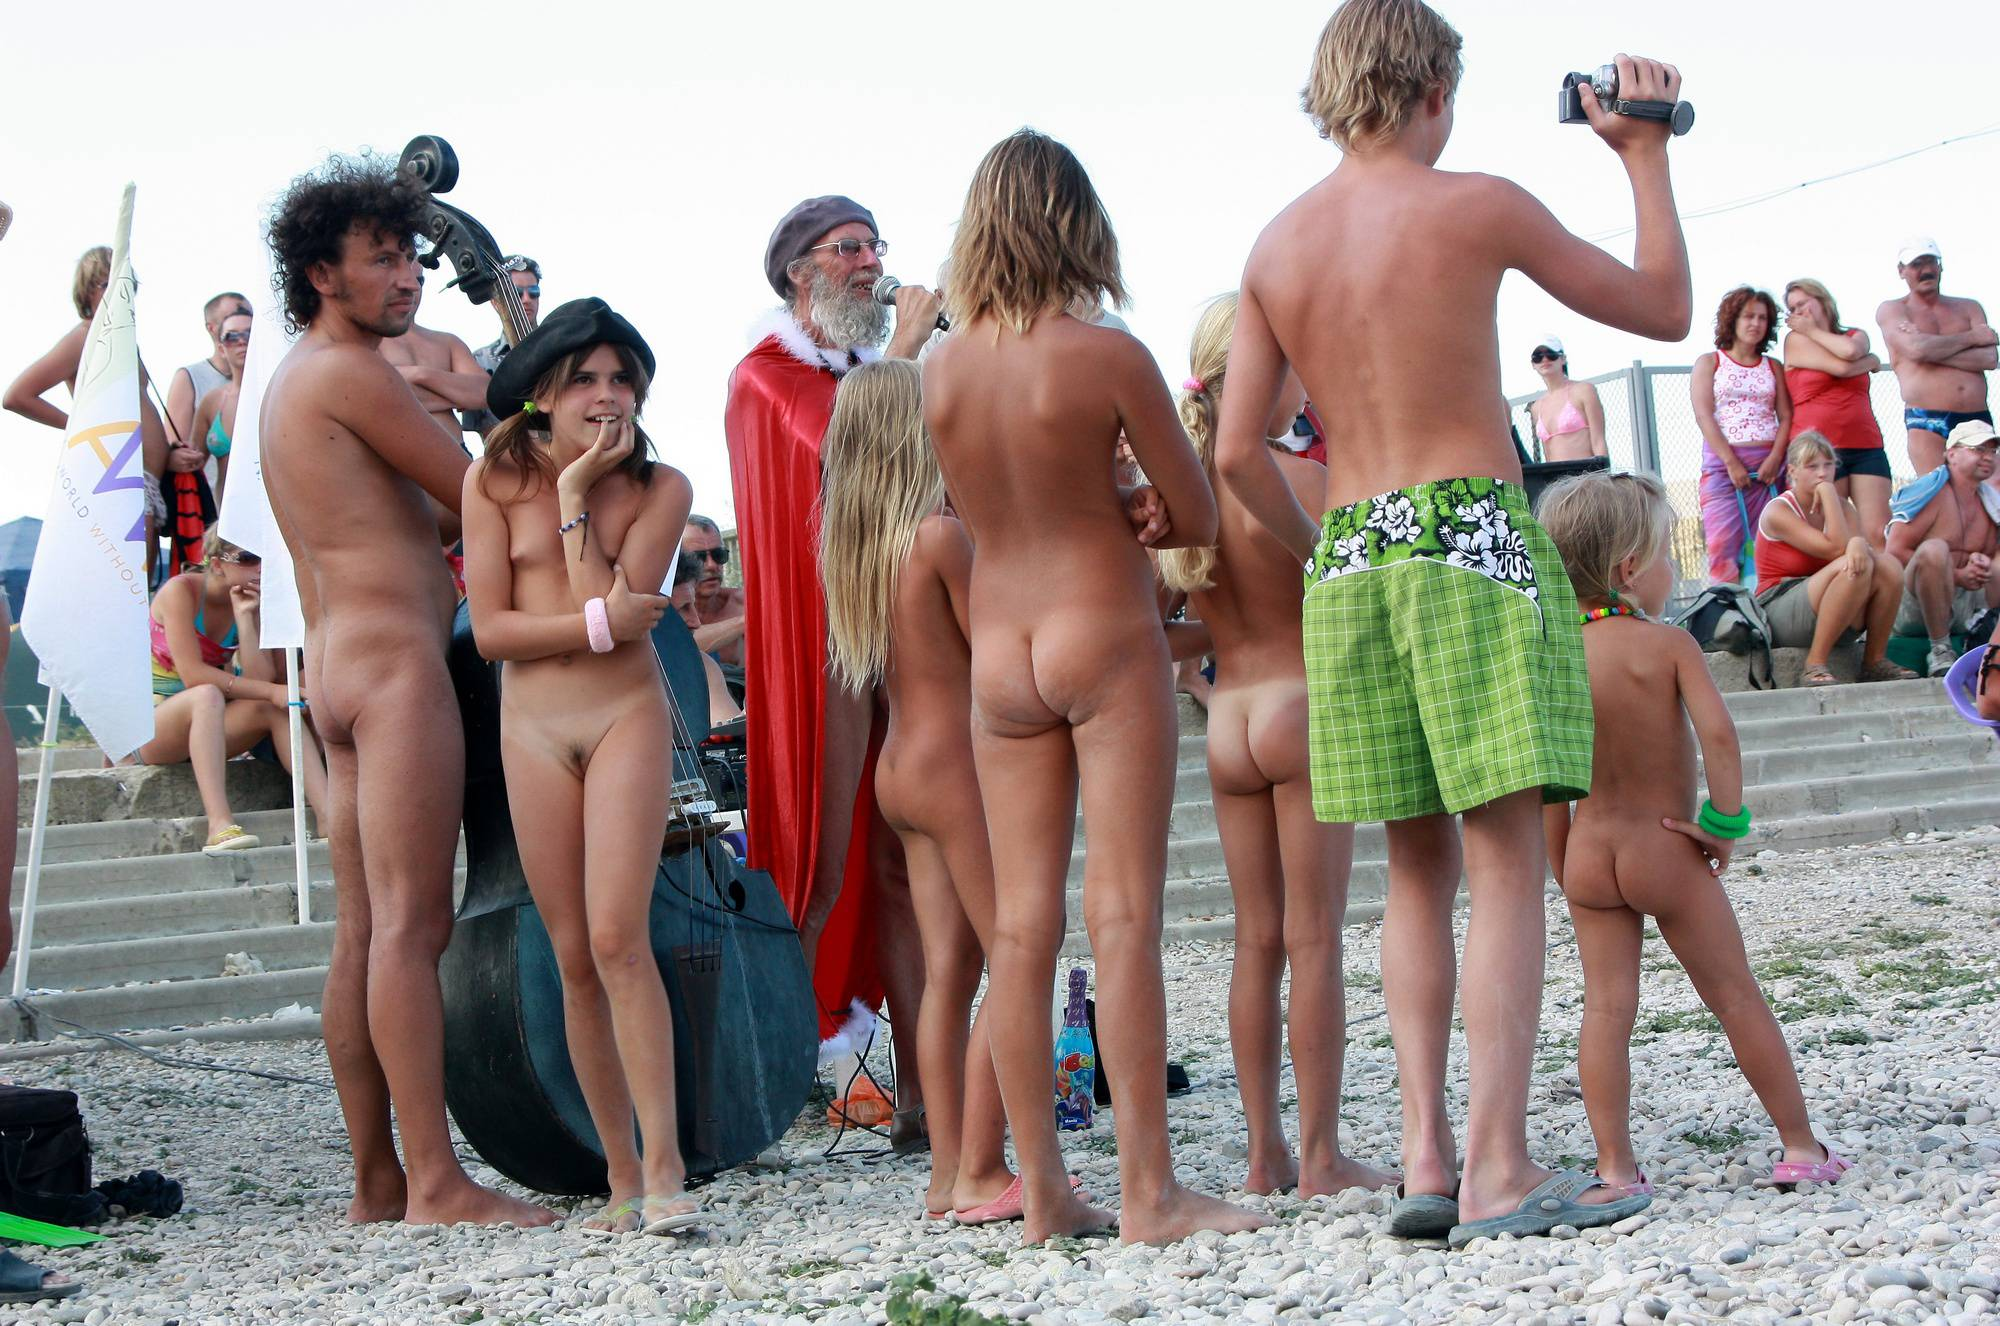 Nudist Photos Group Awarding Moments - 1